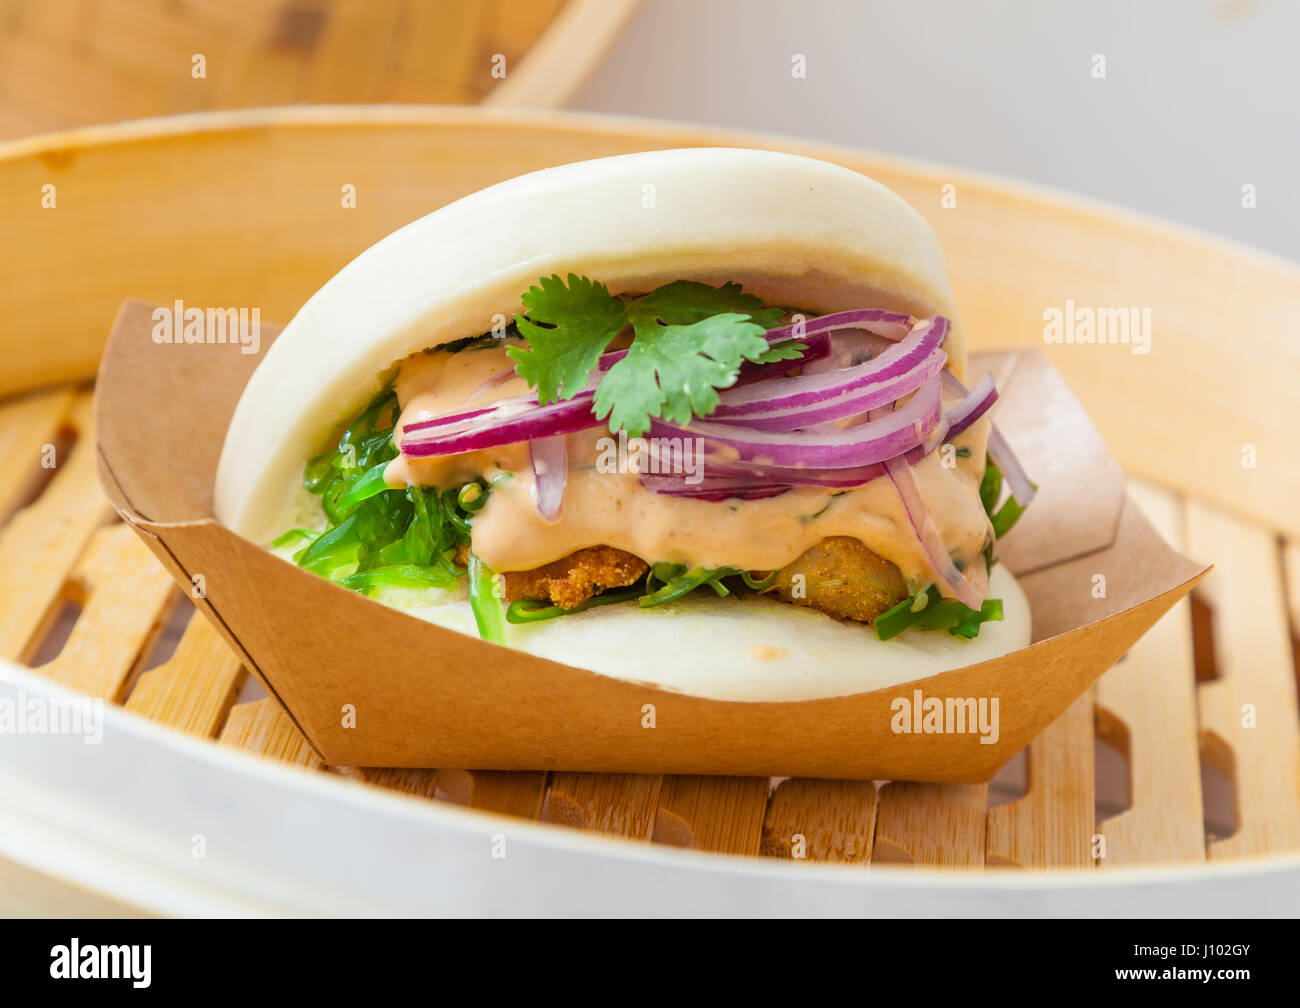 Bao sandwich asian street food stock photo 138299643 alamy bao sandwich asian street food forumfinder Gallery